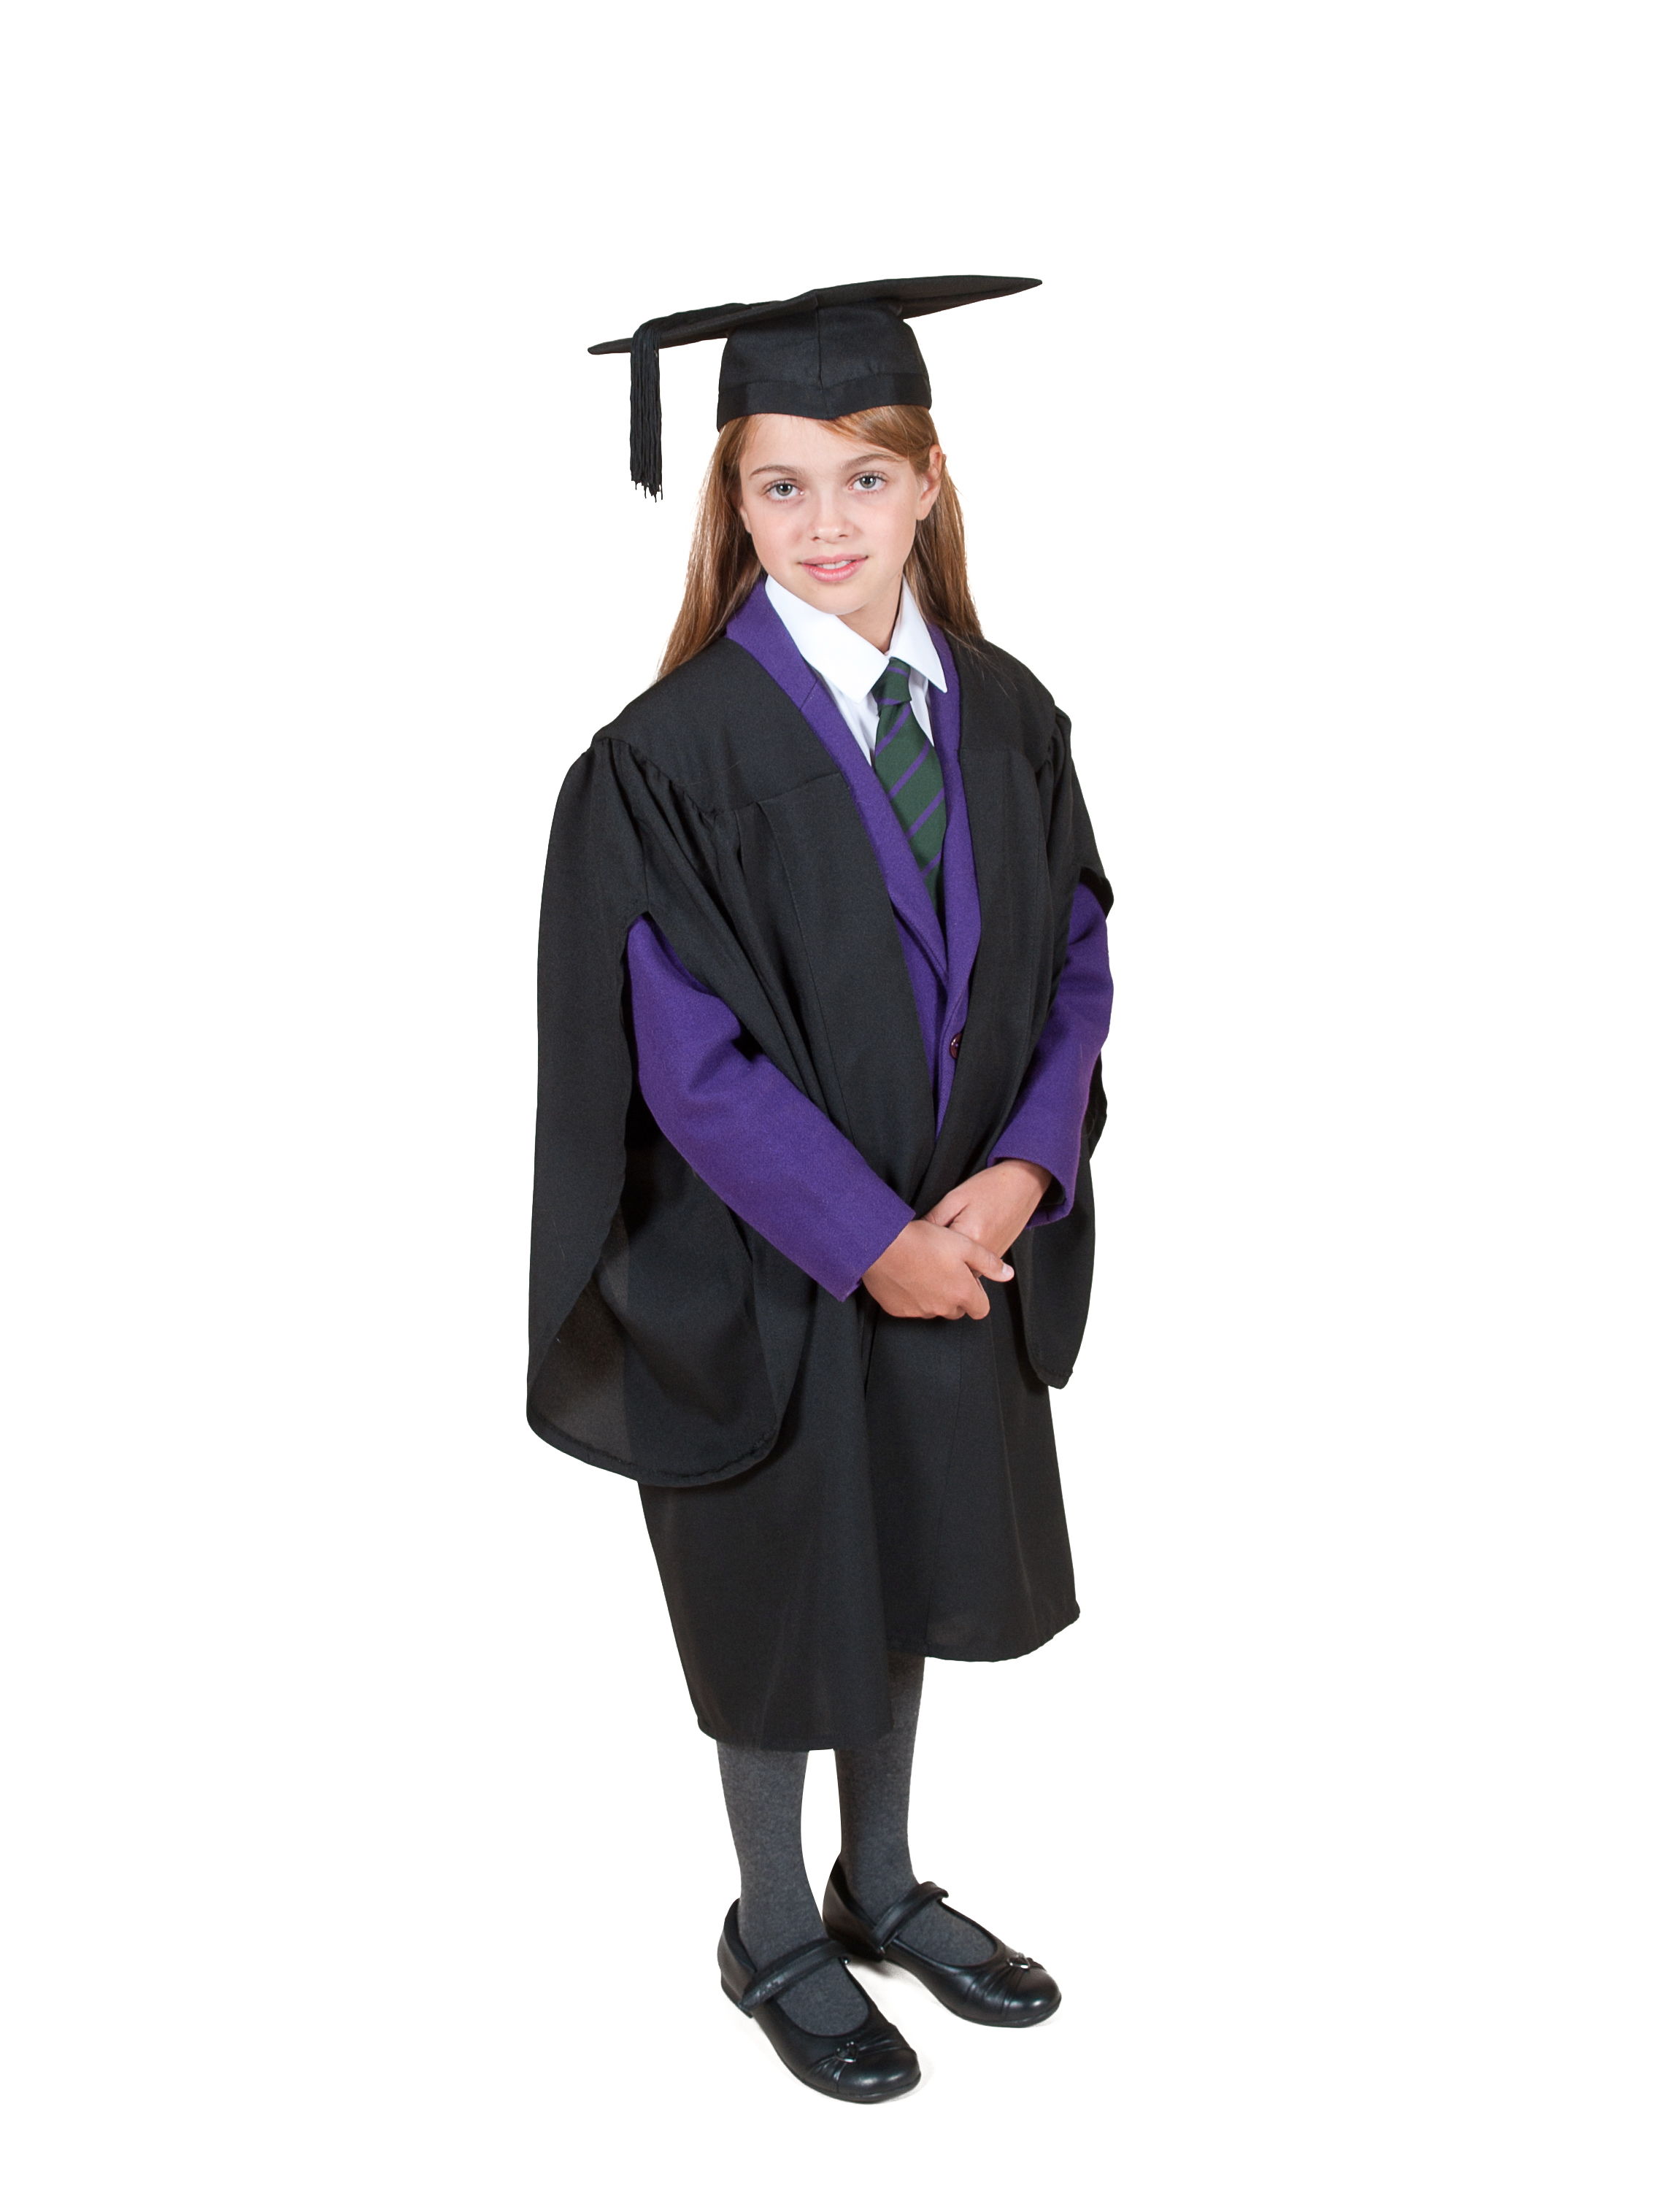 Children's Traditional Graduation Gown